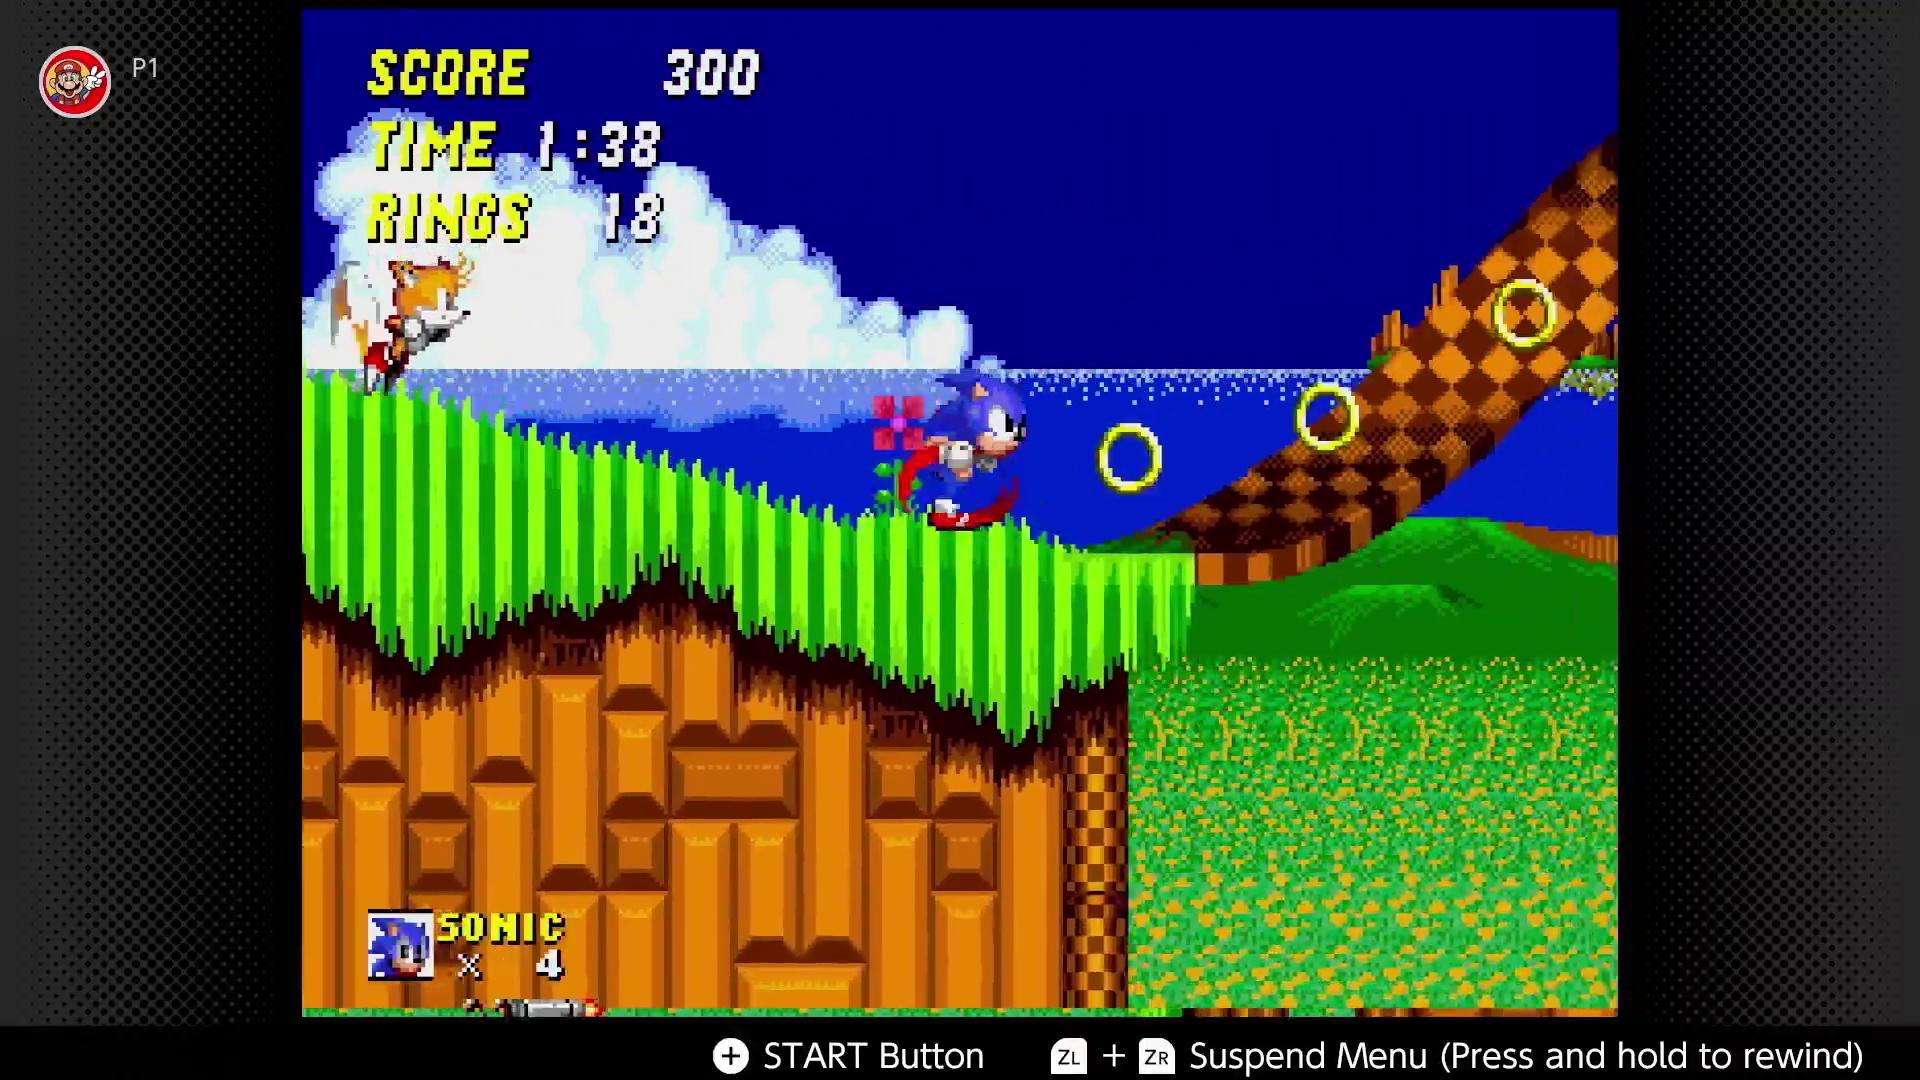 Sonic the Hedgehog 2 on Nintendo Switch